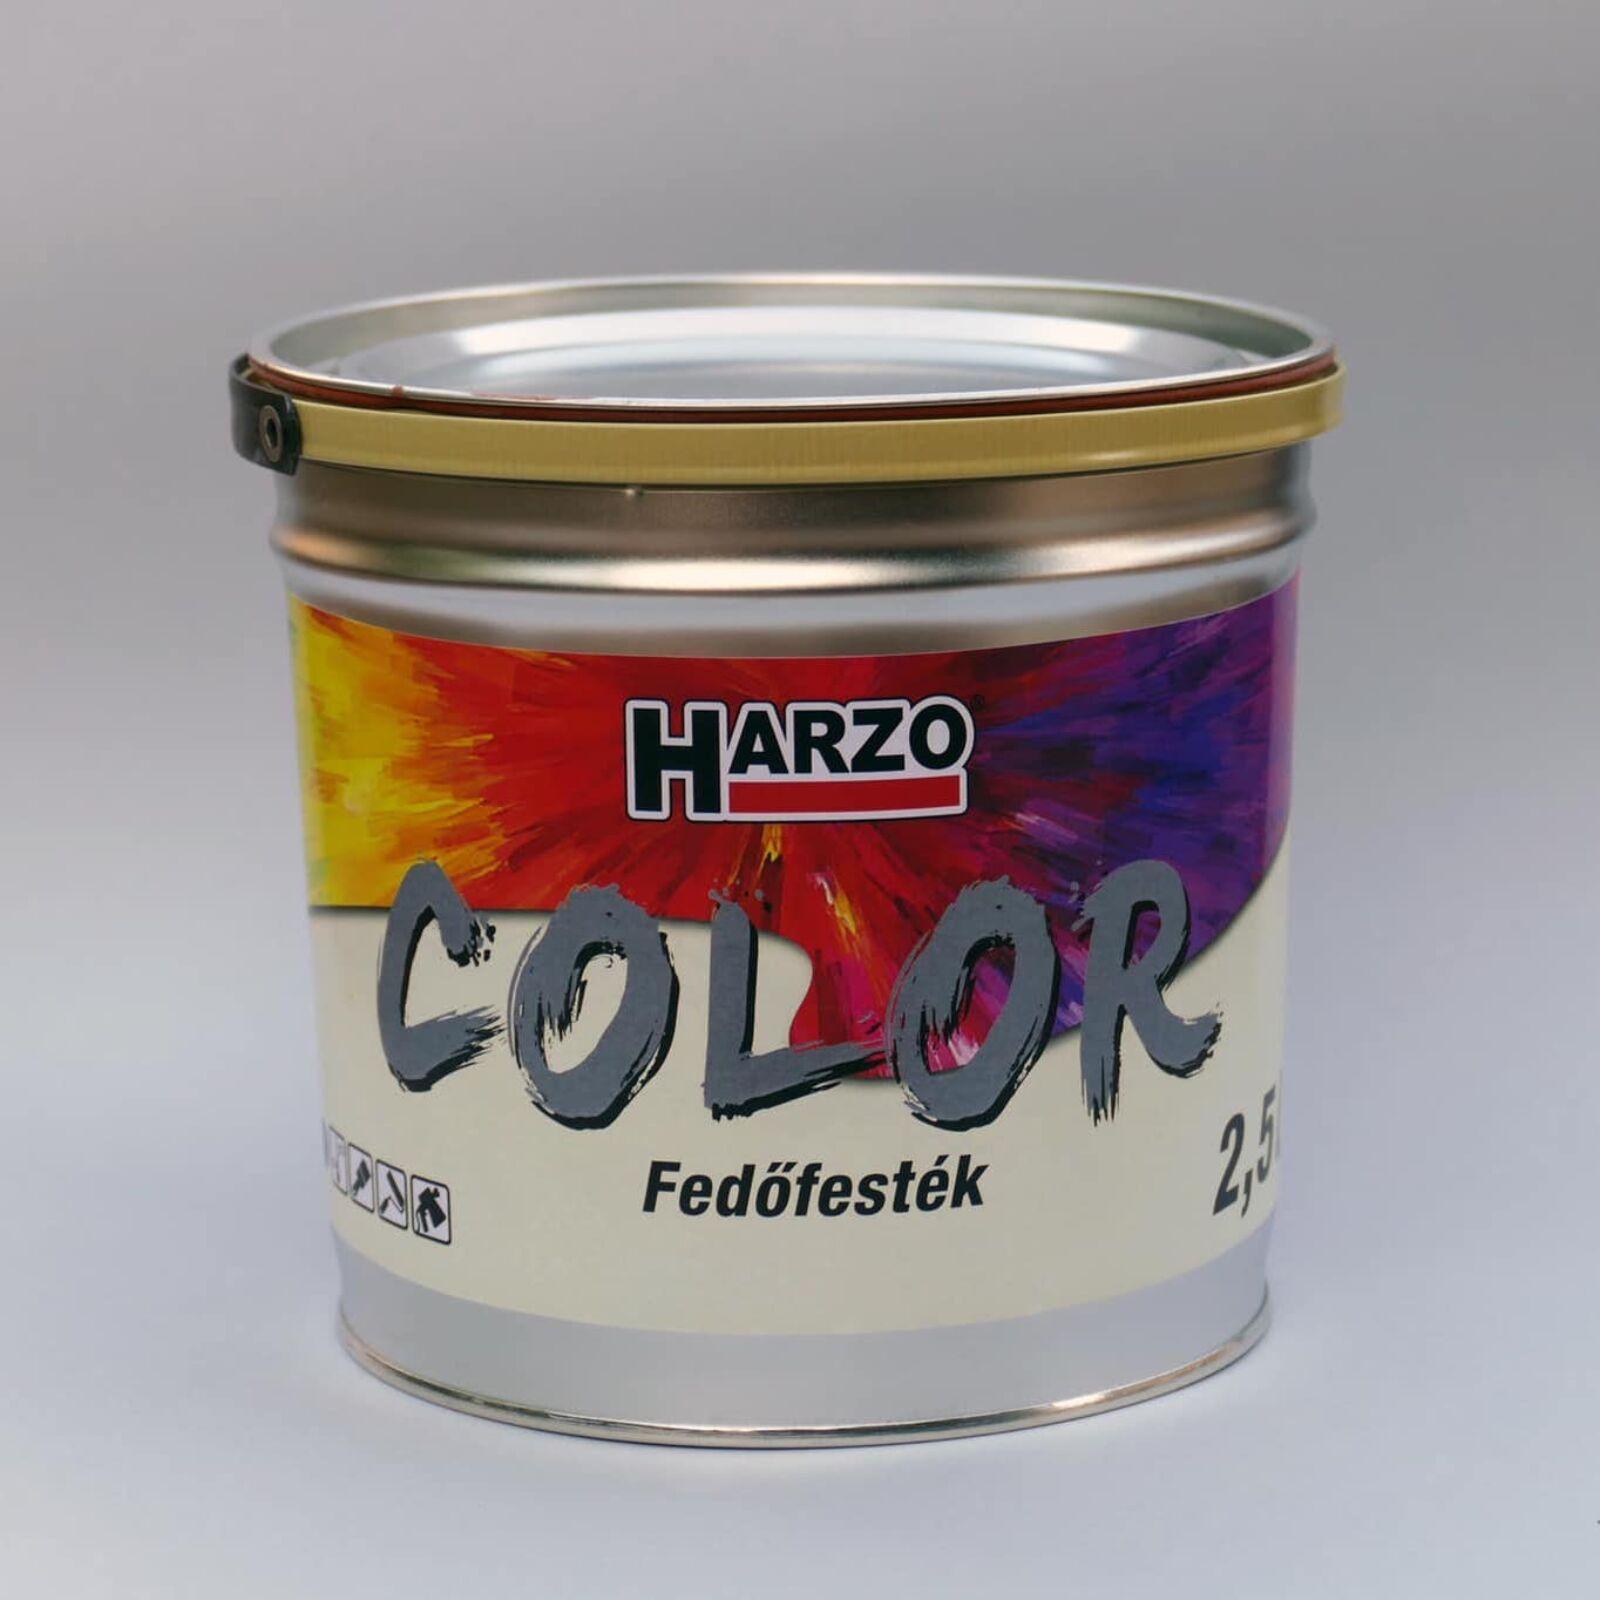 HARZO Color fedőfesték [5 lit]